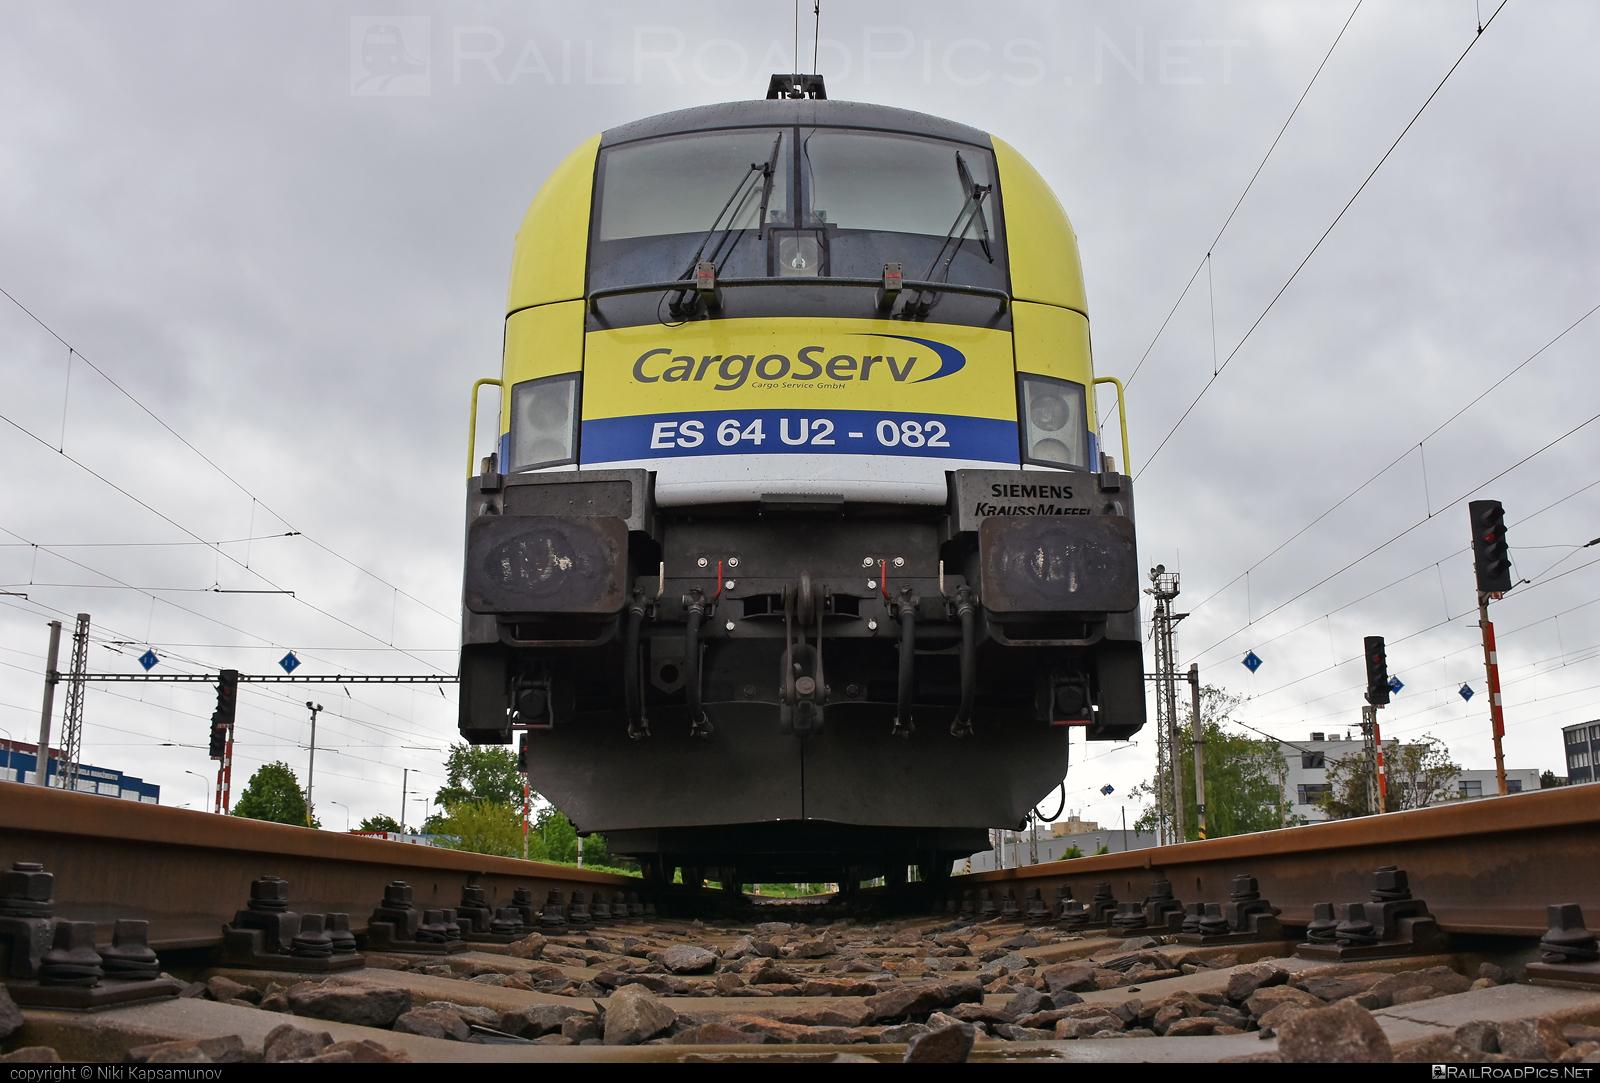 Siemens ES 64 U2 - 182 582-7 operated by CargoServ GmbH #cargoserv #dispolok #es64 #es64u #es64u2 #eurosprinter #mitsuirailcapitaleurope #mitsuirailcapitaleuropegmbh #mrce #siemens #siemenses64 #siemenses64u #siemenses64u2 #siemenstaurus #taurus #tauruslocomotive